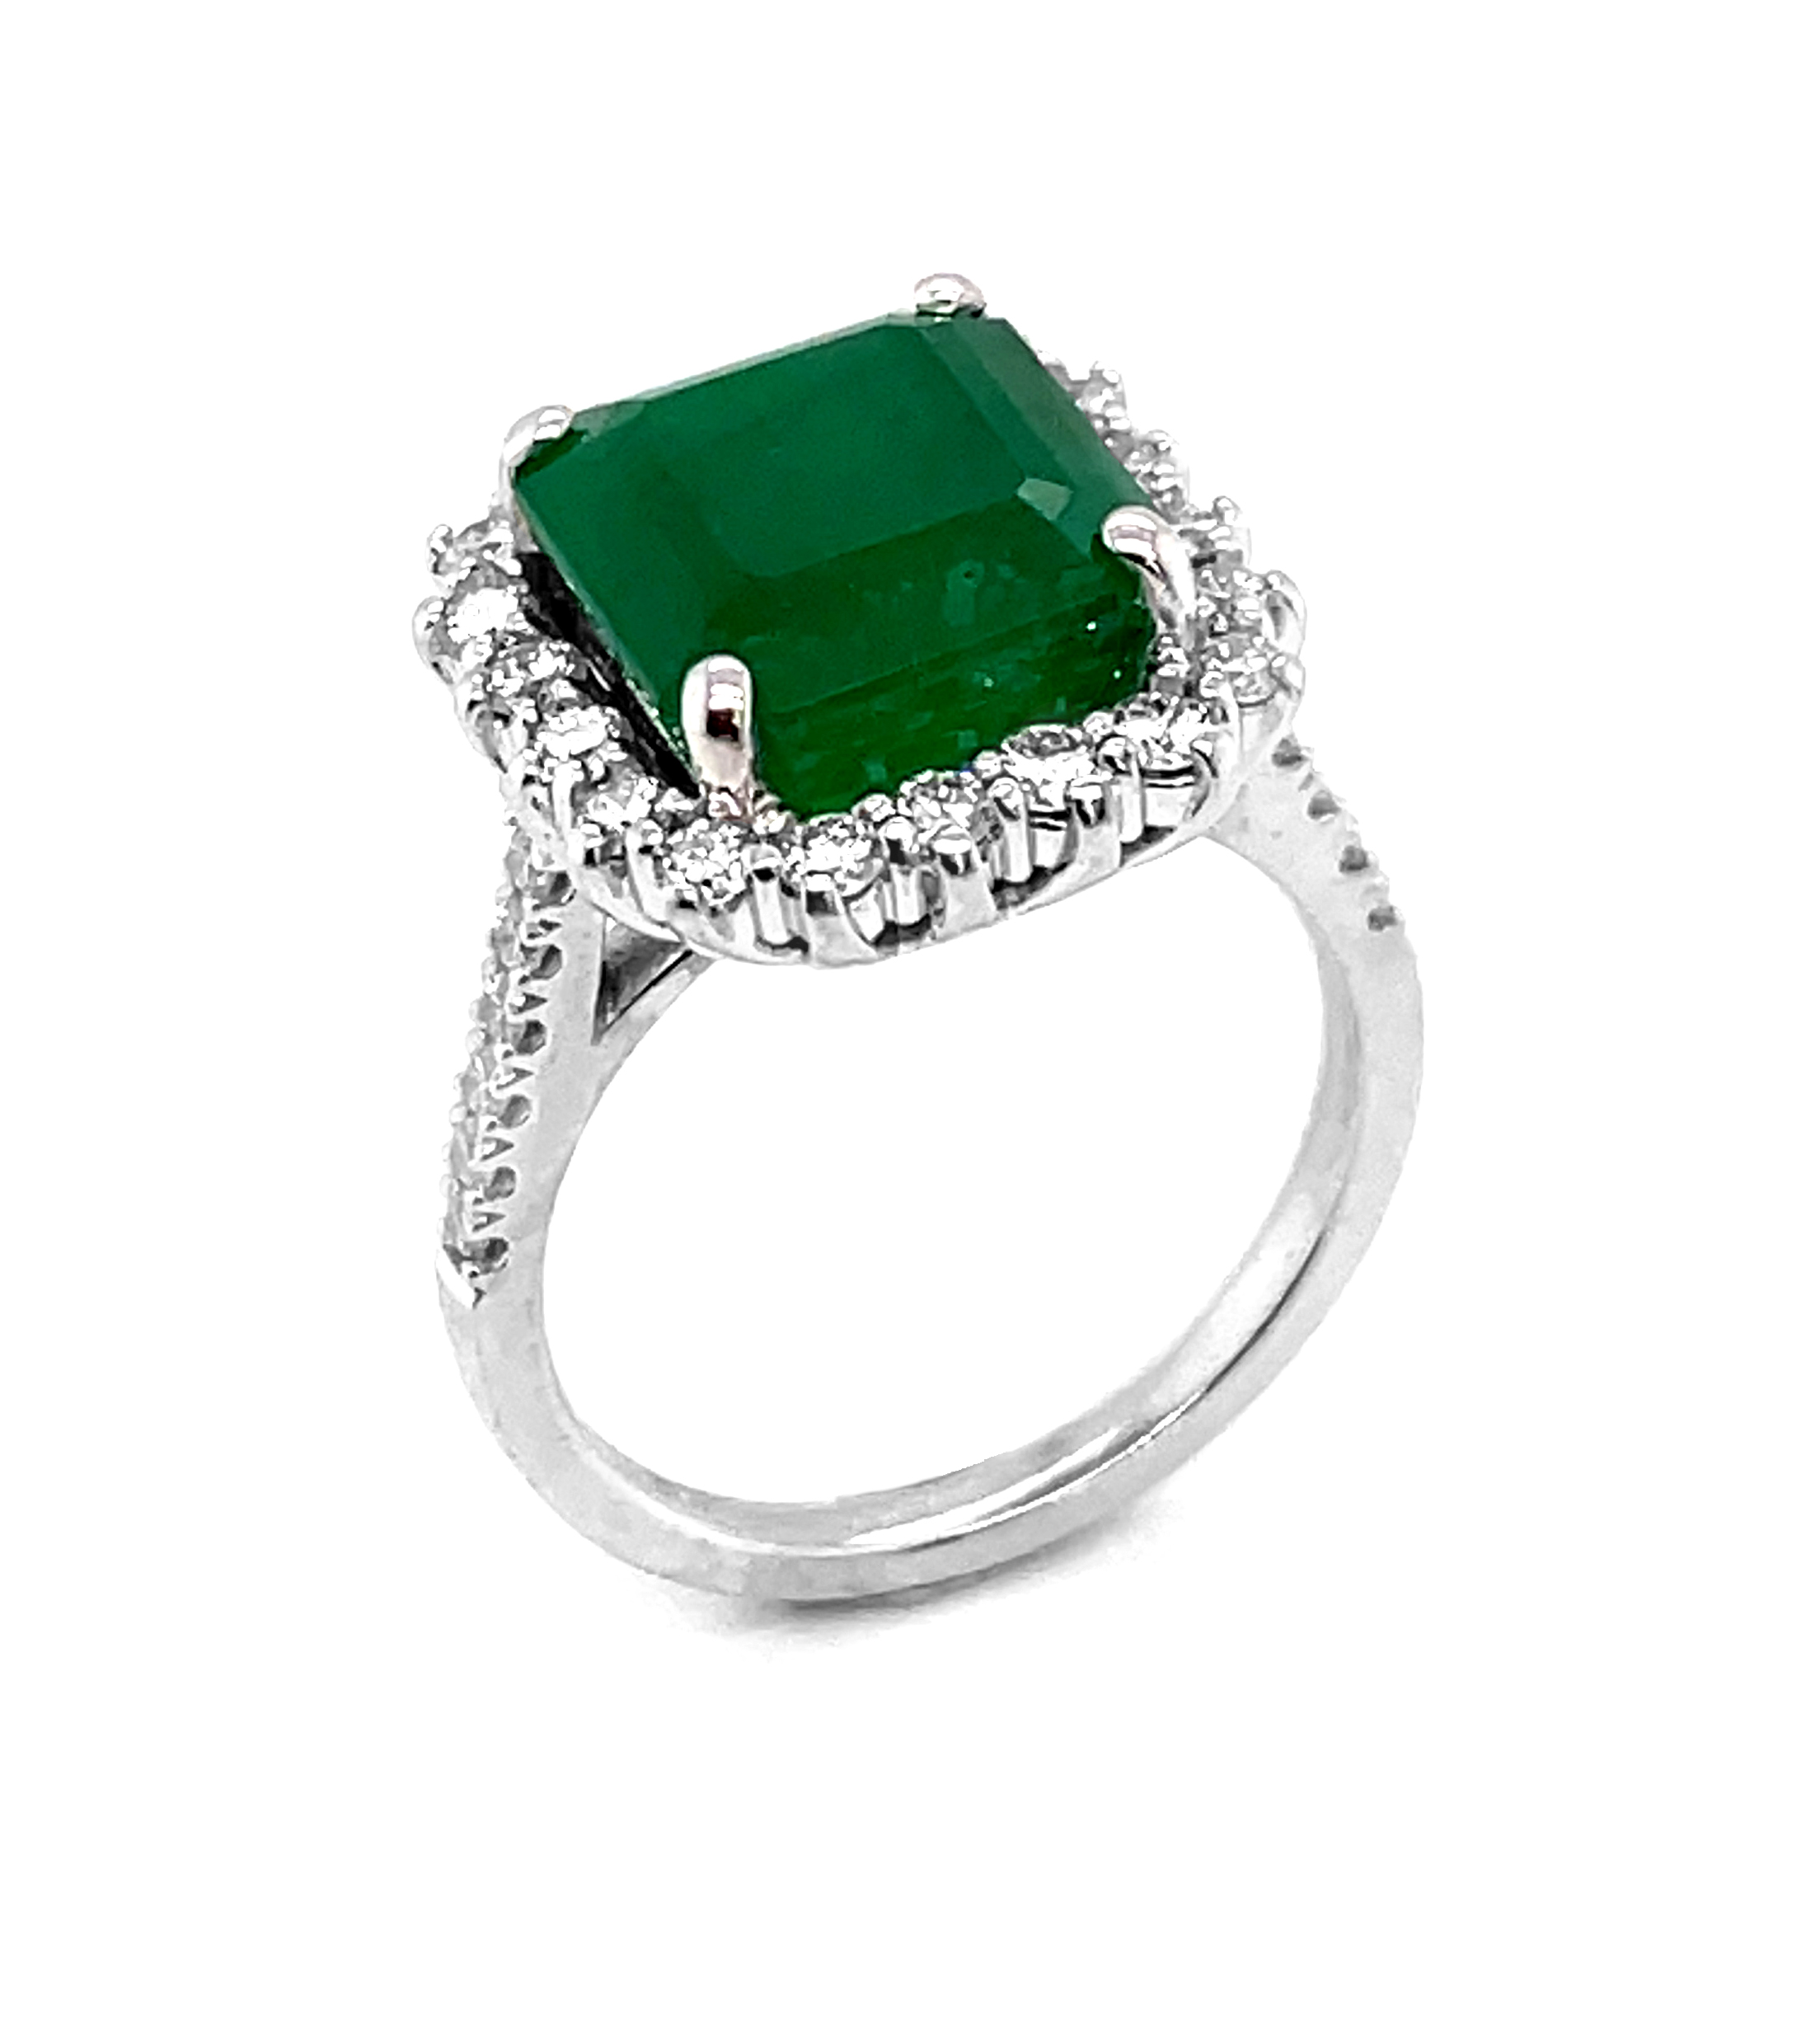 18k White Gold Octagonal Emerald & Brilliant Cut Diamond Cluster Ring